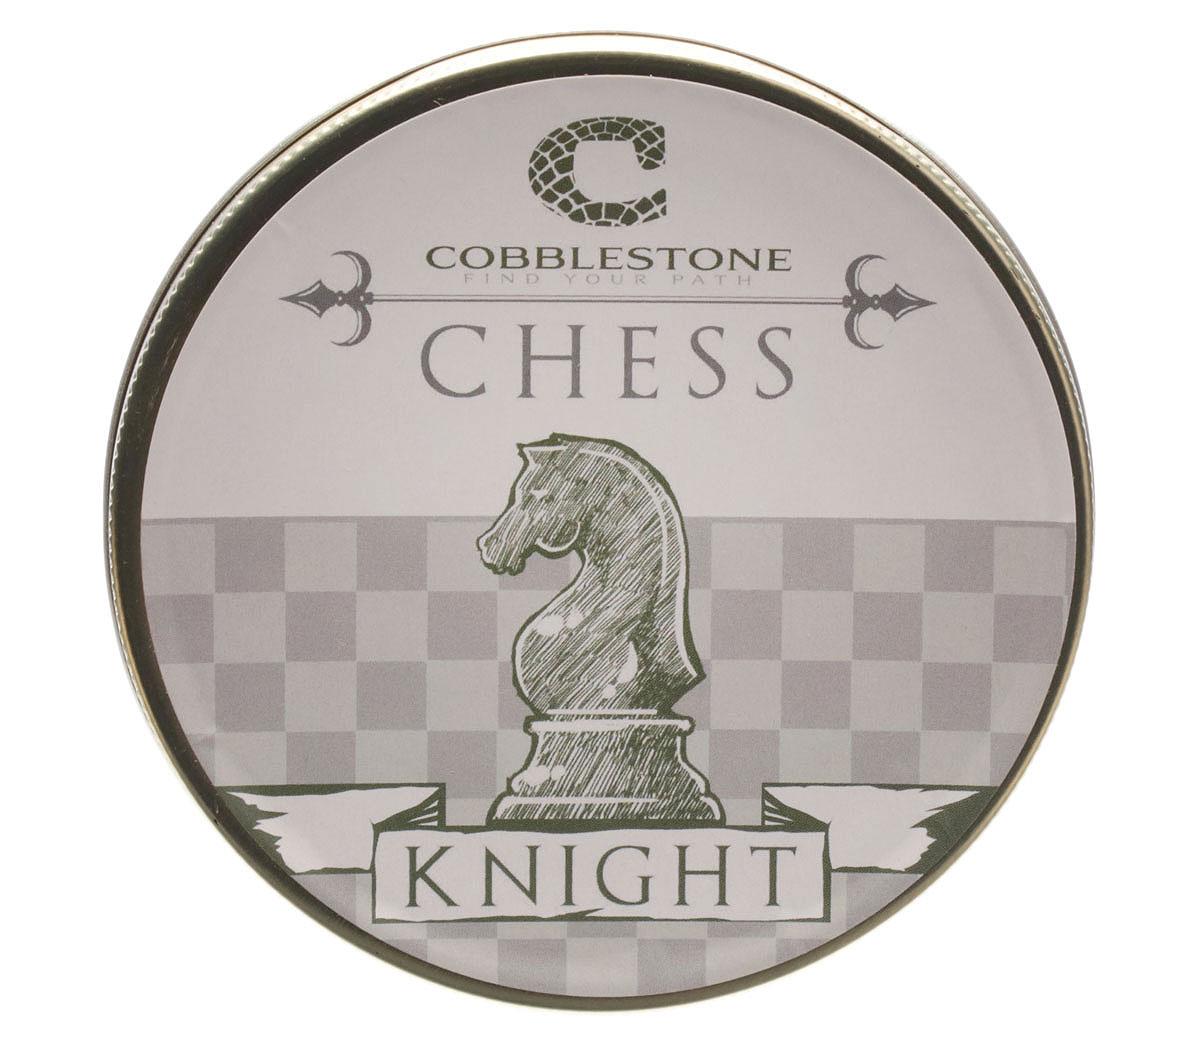 Cobblestone Chess Knight 1.75oz